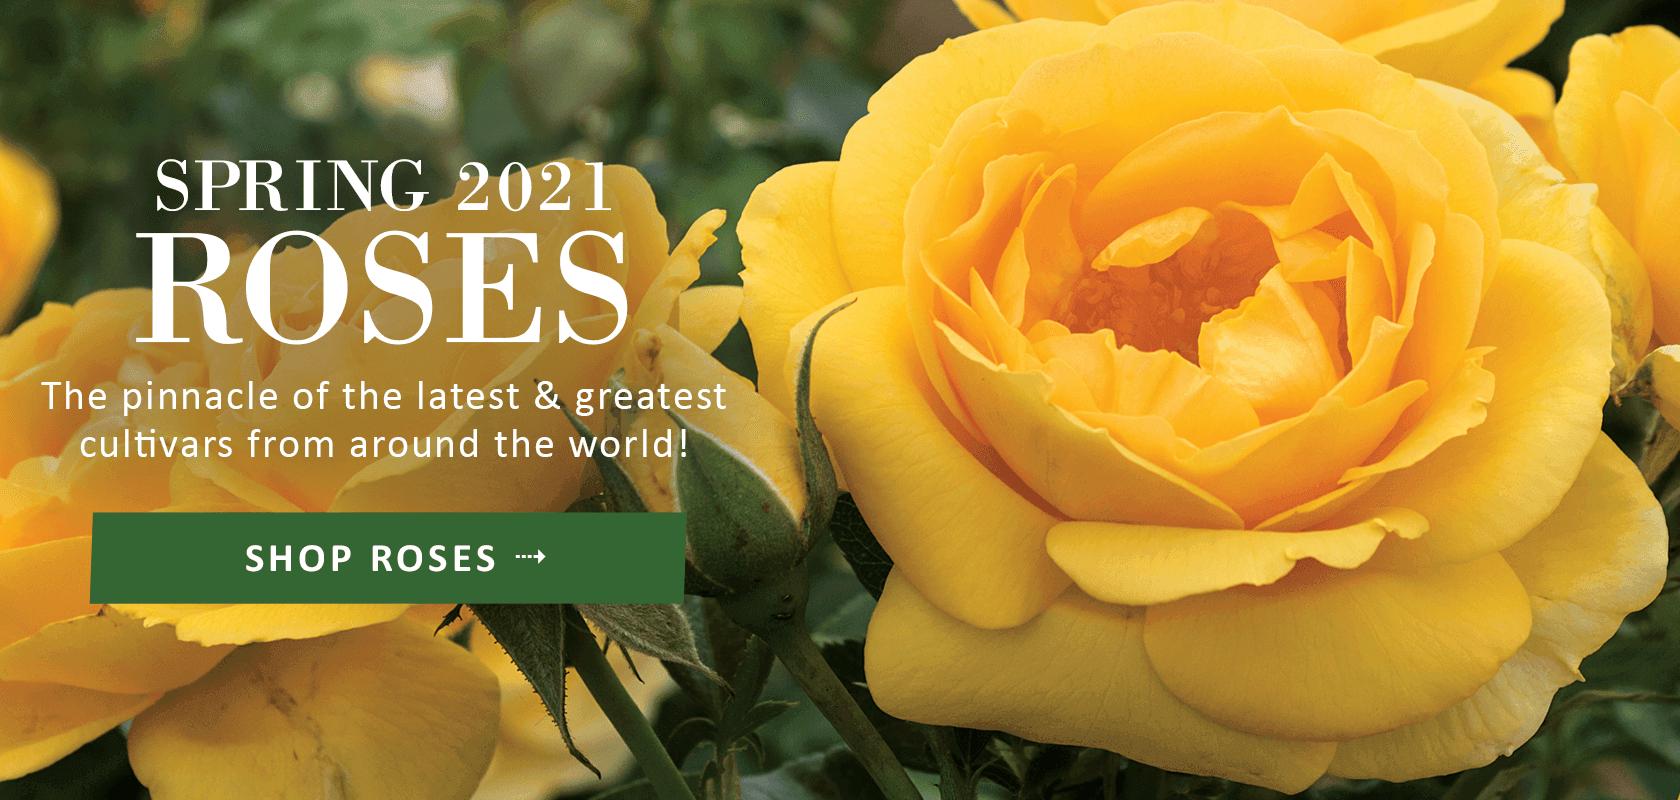 Spring 2021 Roses